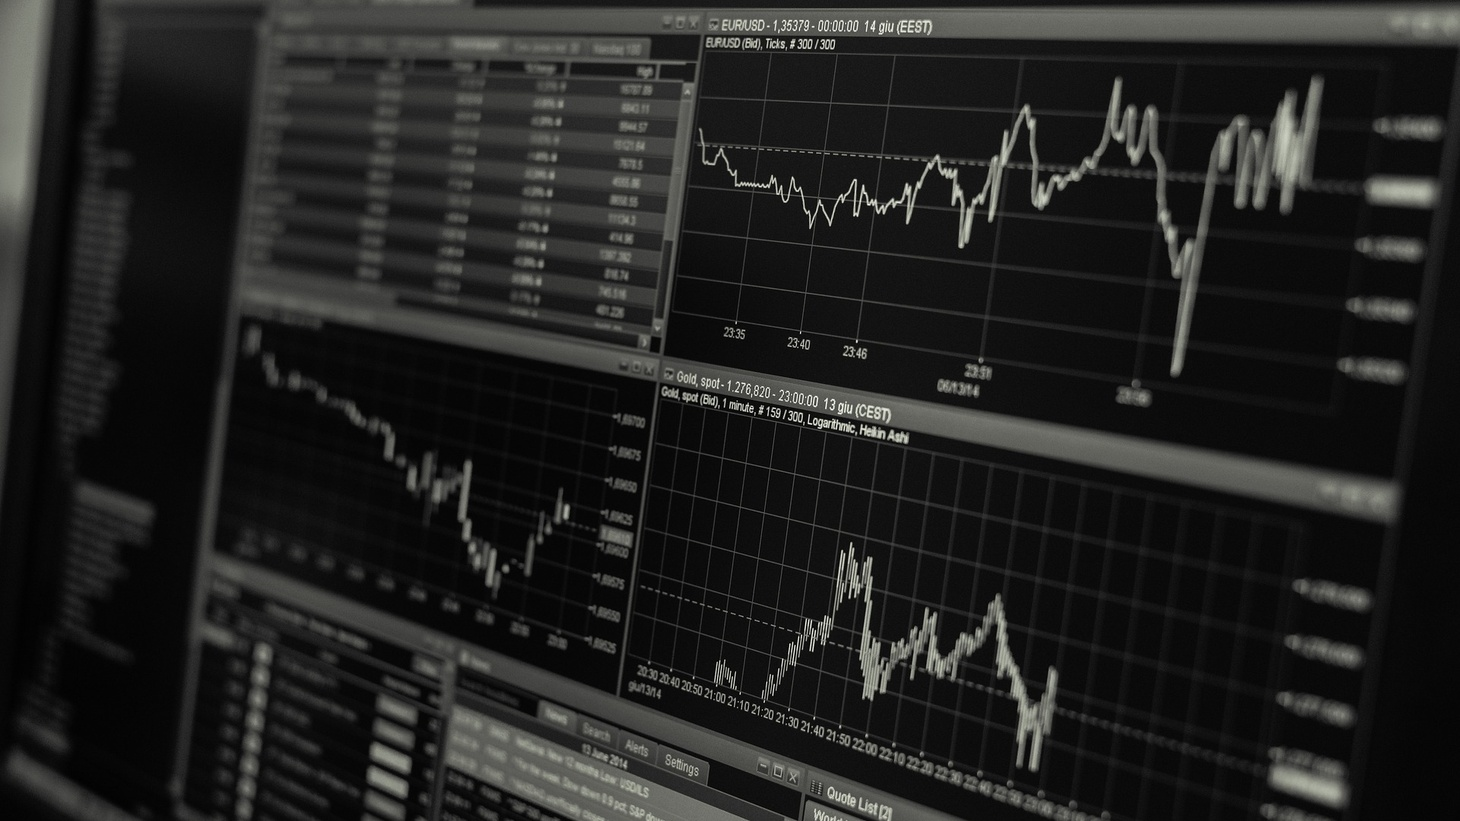 Monitoring stocks.